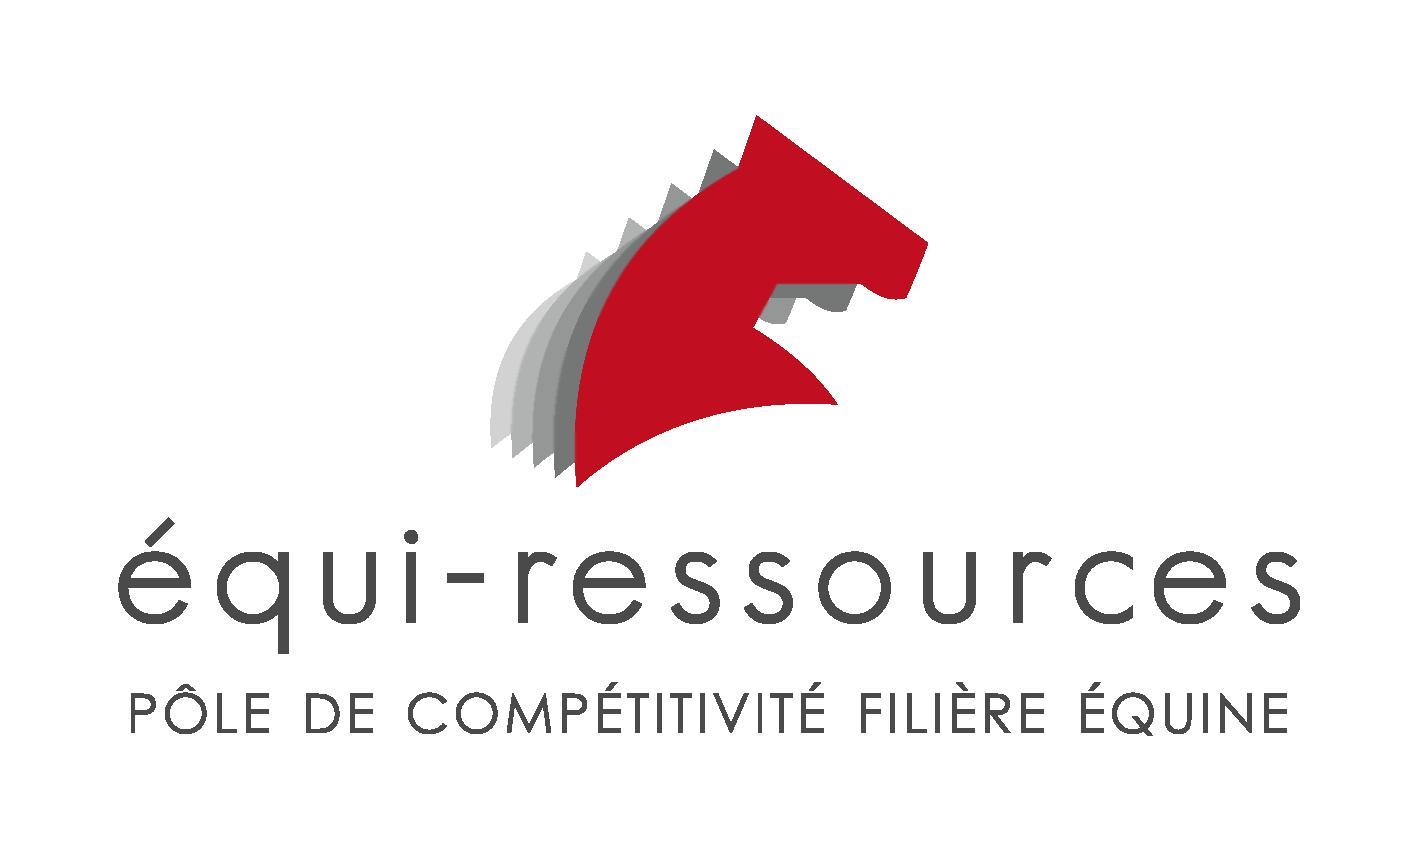 Bilan des offres d'emploi Equiressources au 30 novembre 2017